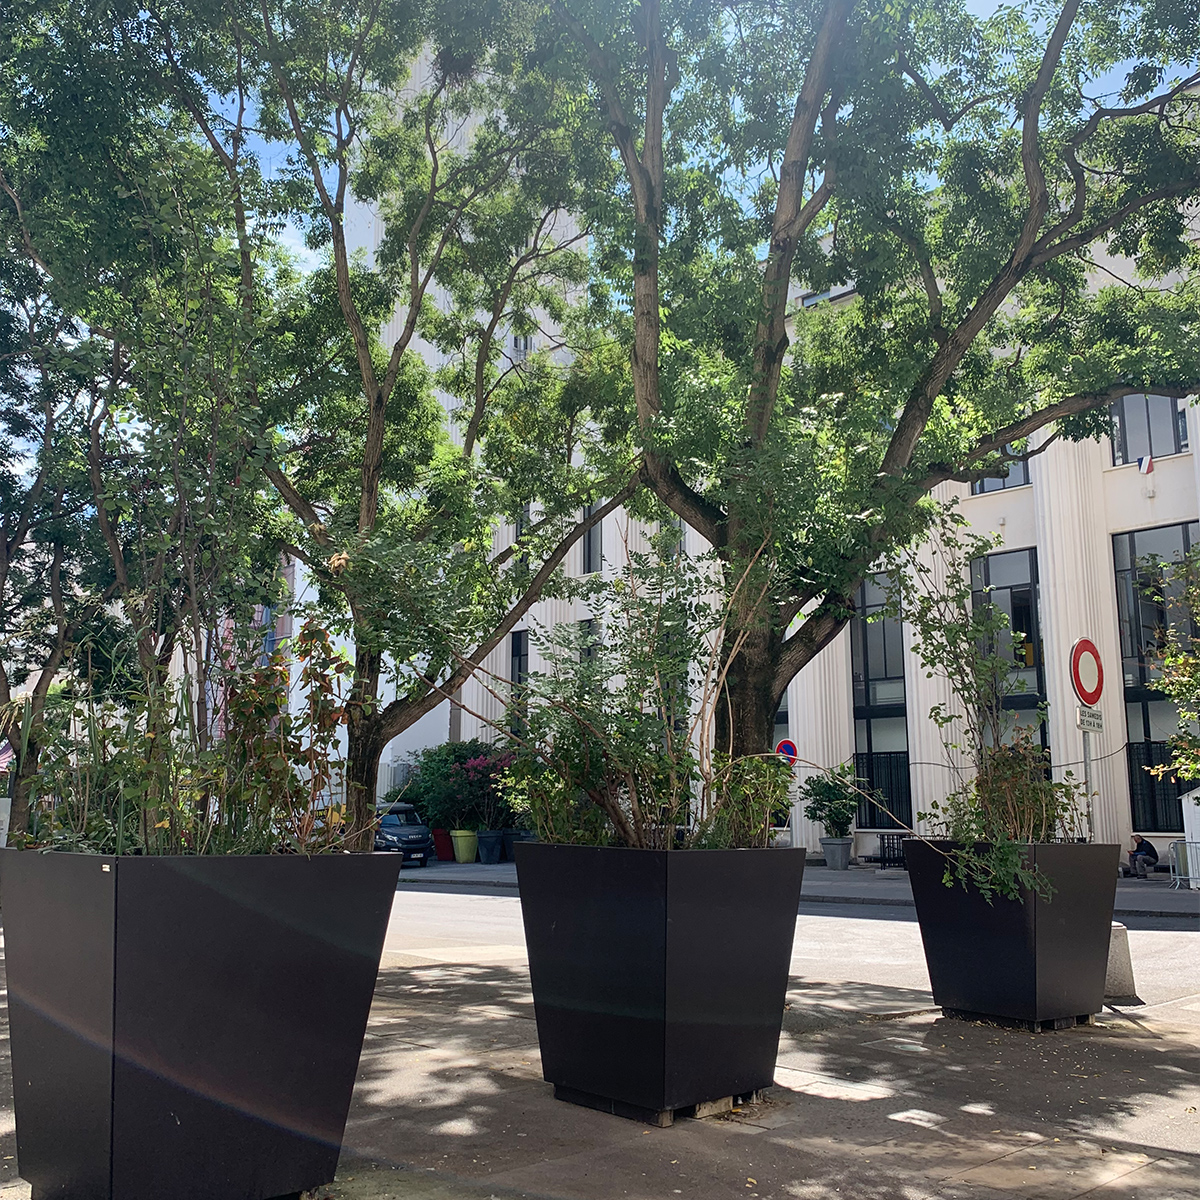 ATECH-eco-district-design-green-city-hedera-range